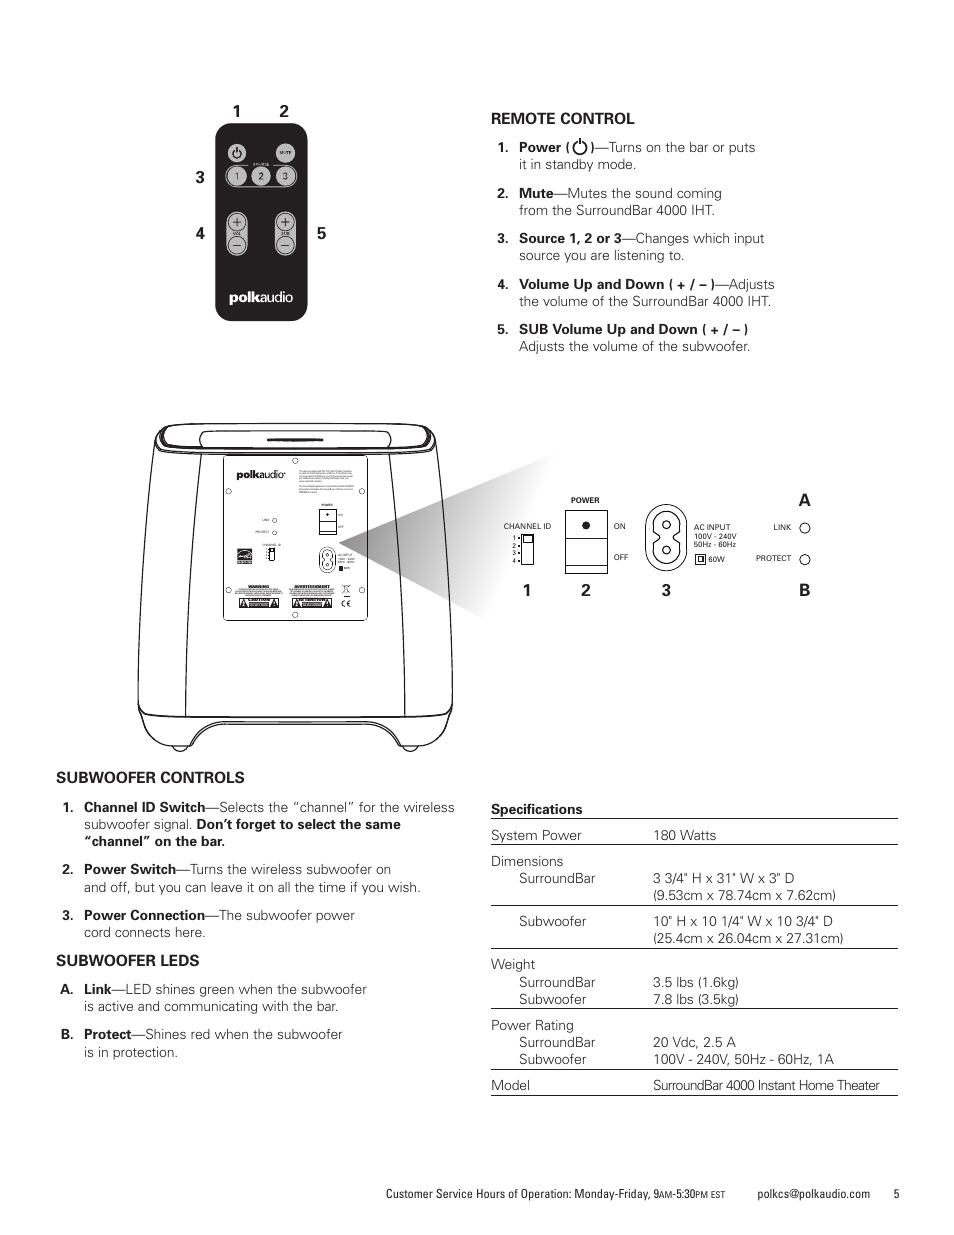 hight resolution of ab 1 2 3 subwoofer controls subwoofer leds polk audio surroundbar 4000 user manual page 5 12